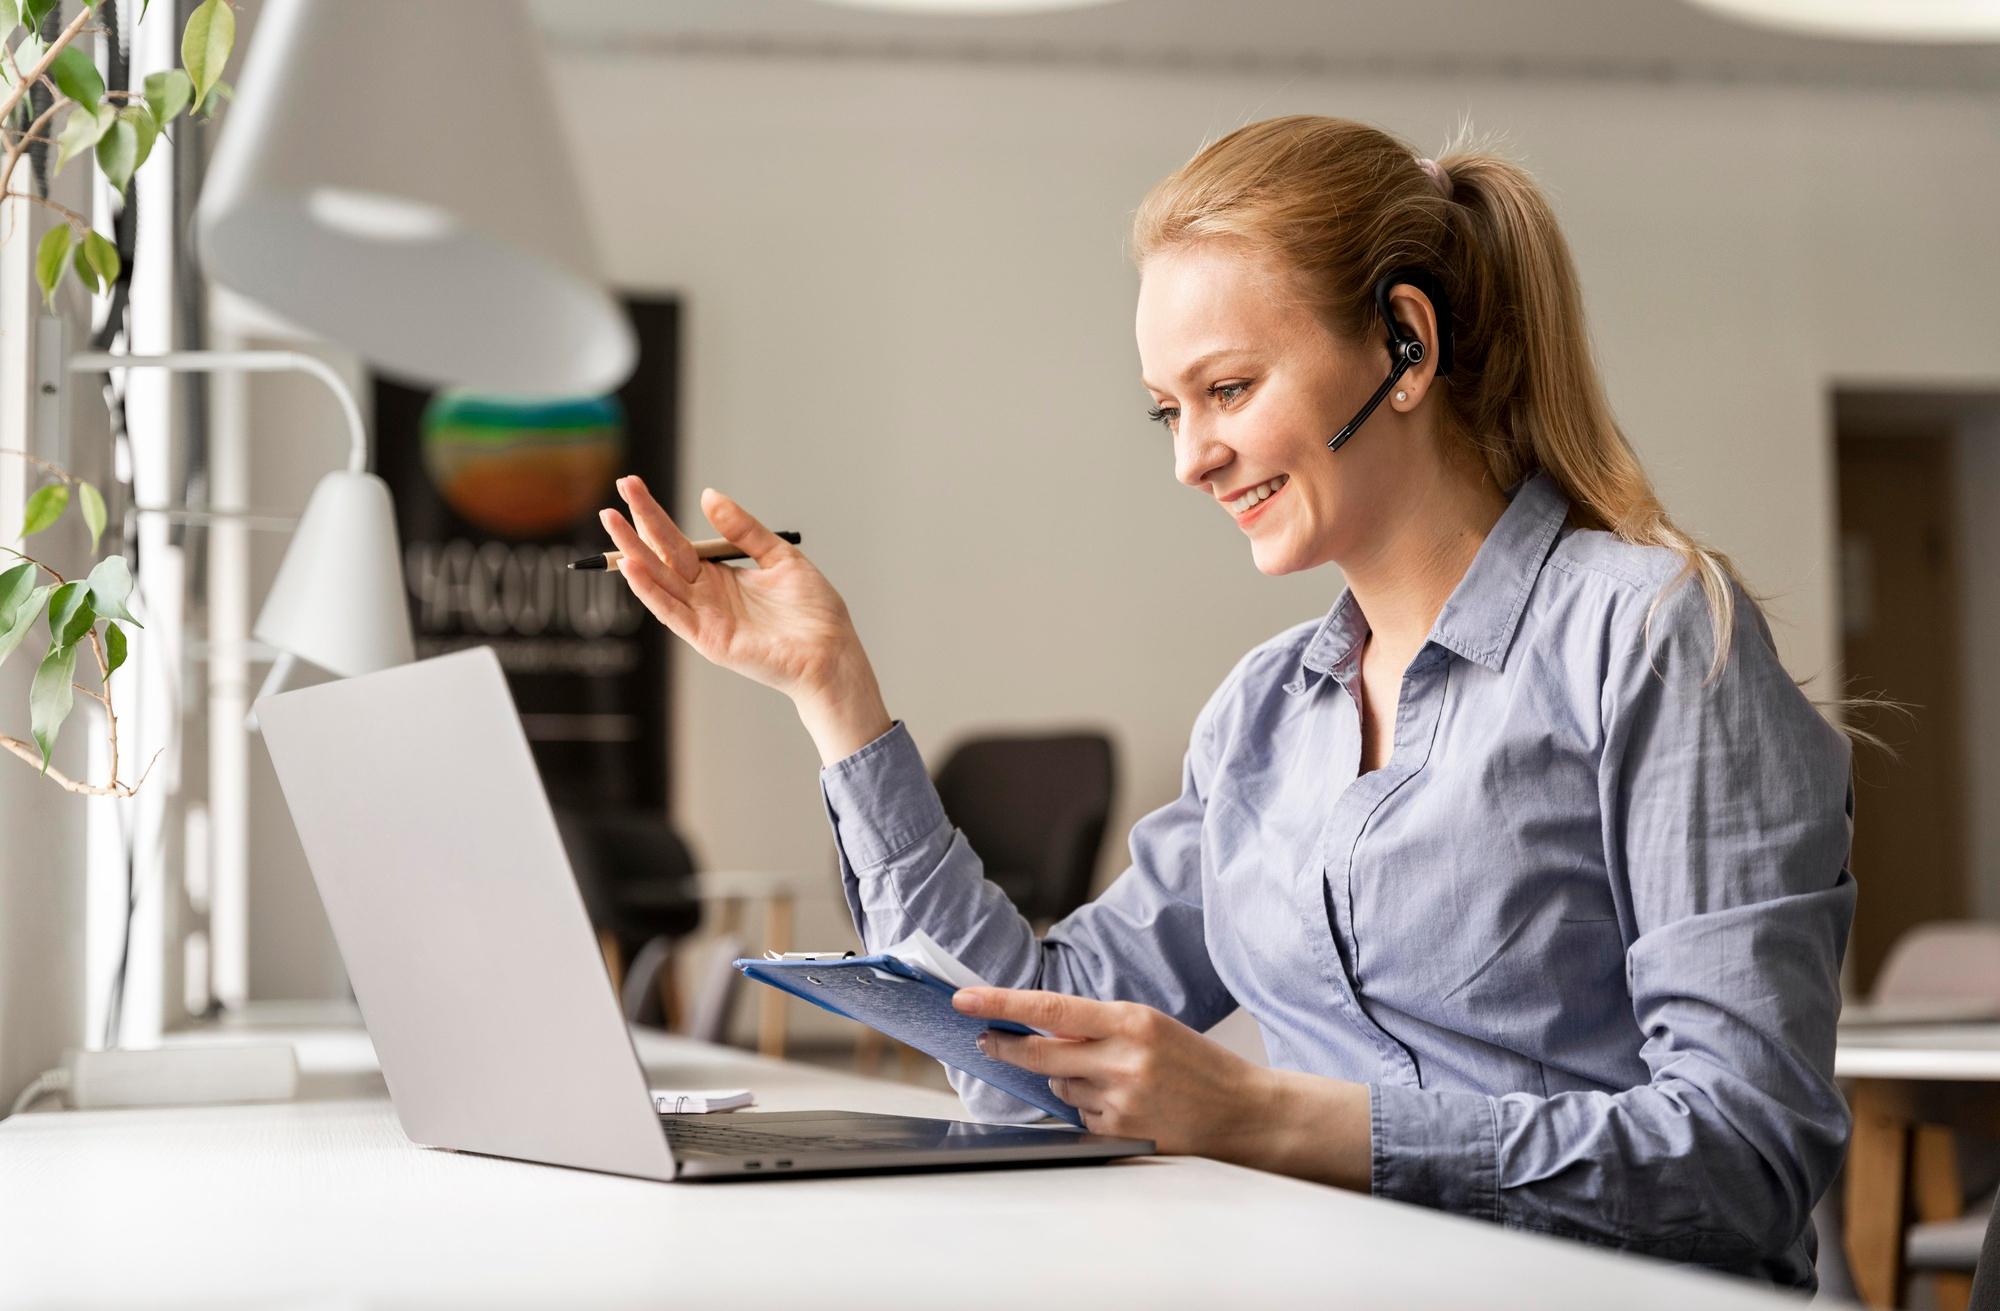 Provide Meaningful Feedback to Each Virtual Team Member